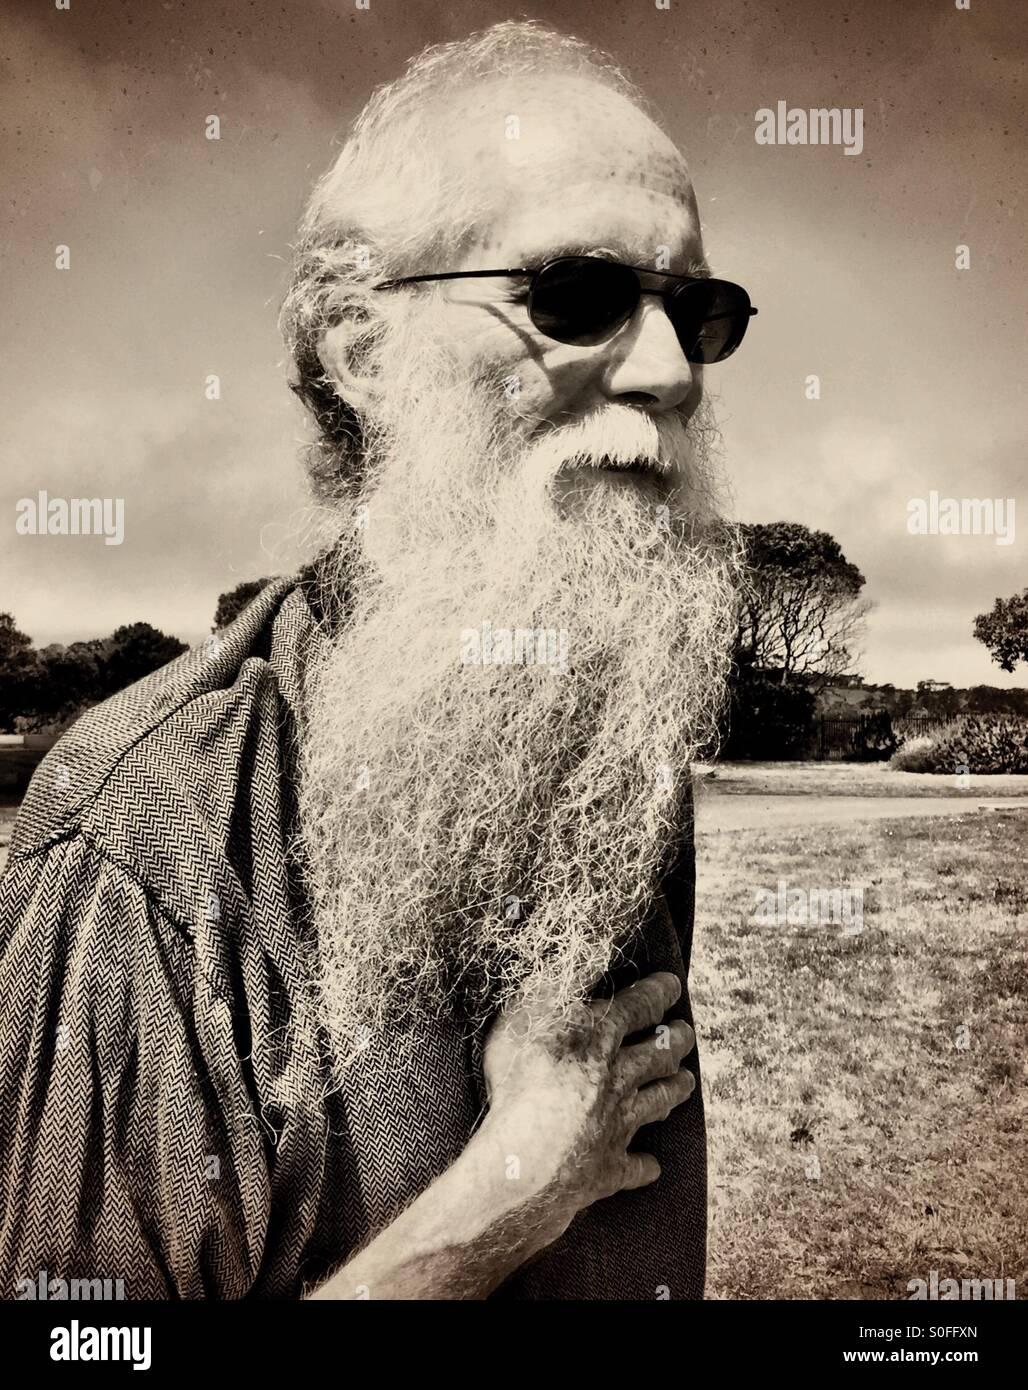 9fd2abc761c7 Elderly man with long white gray beard